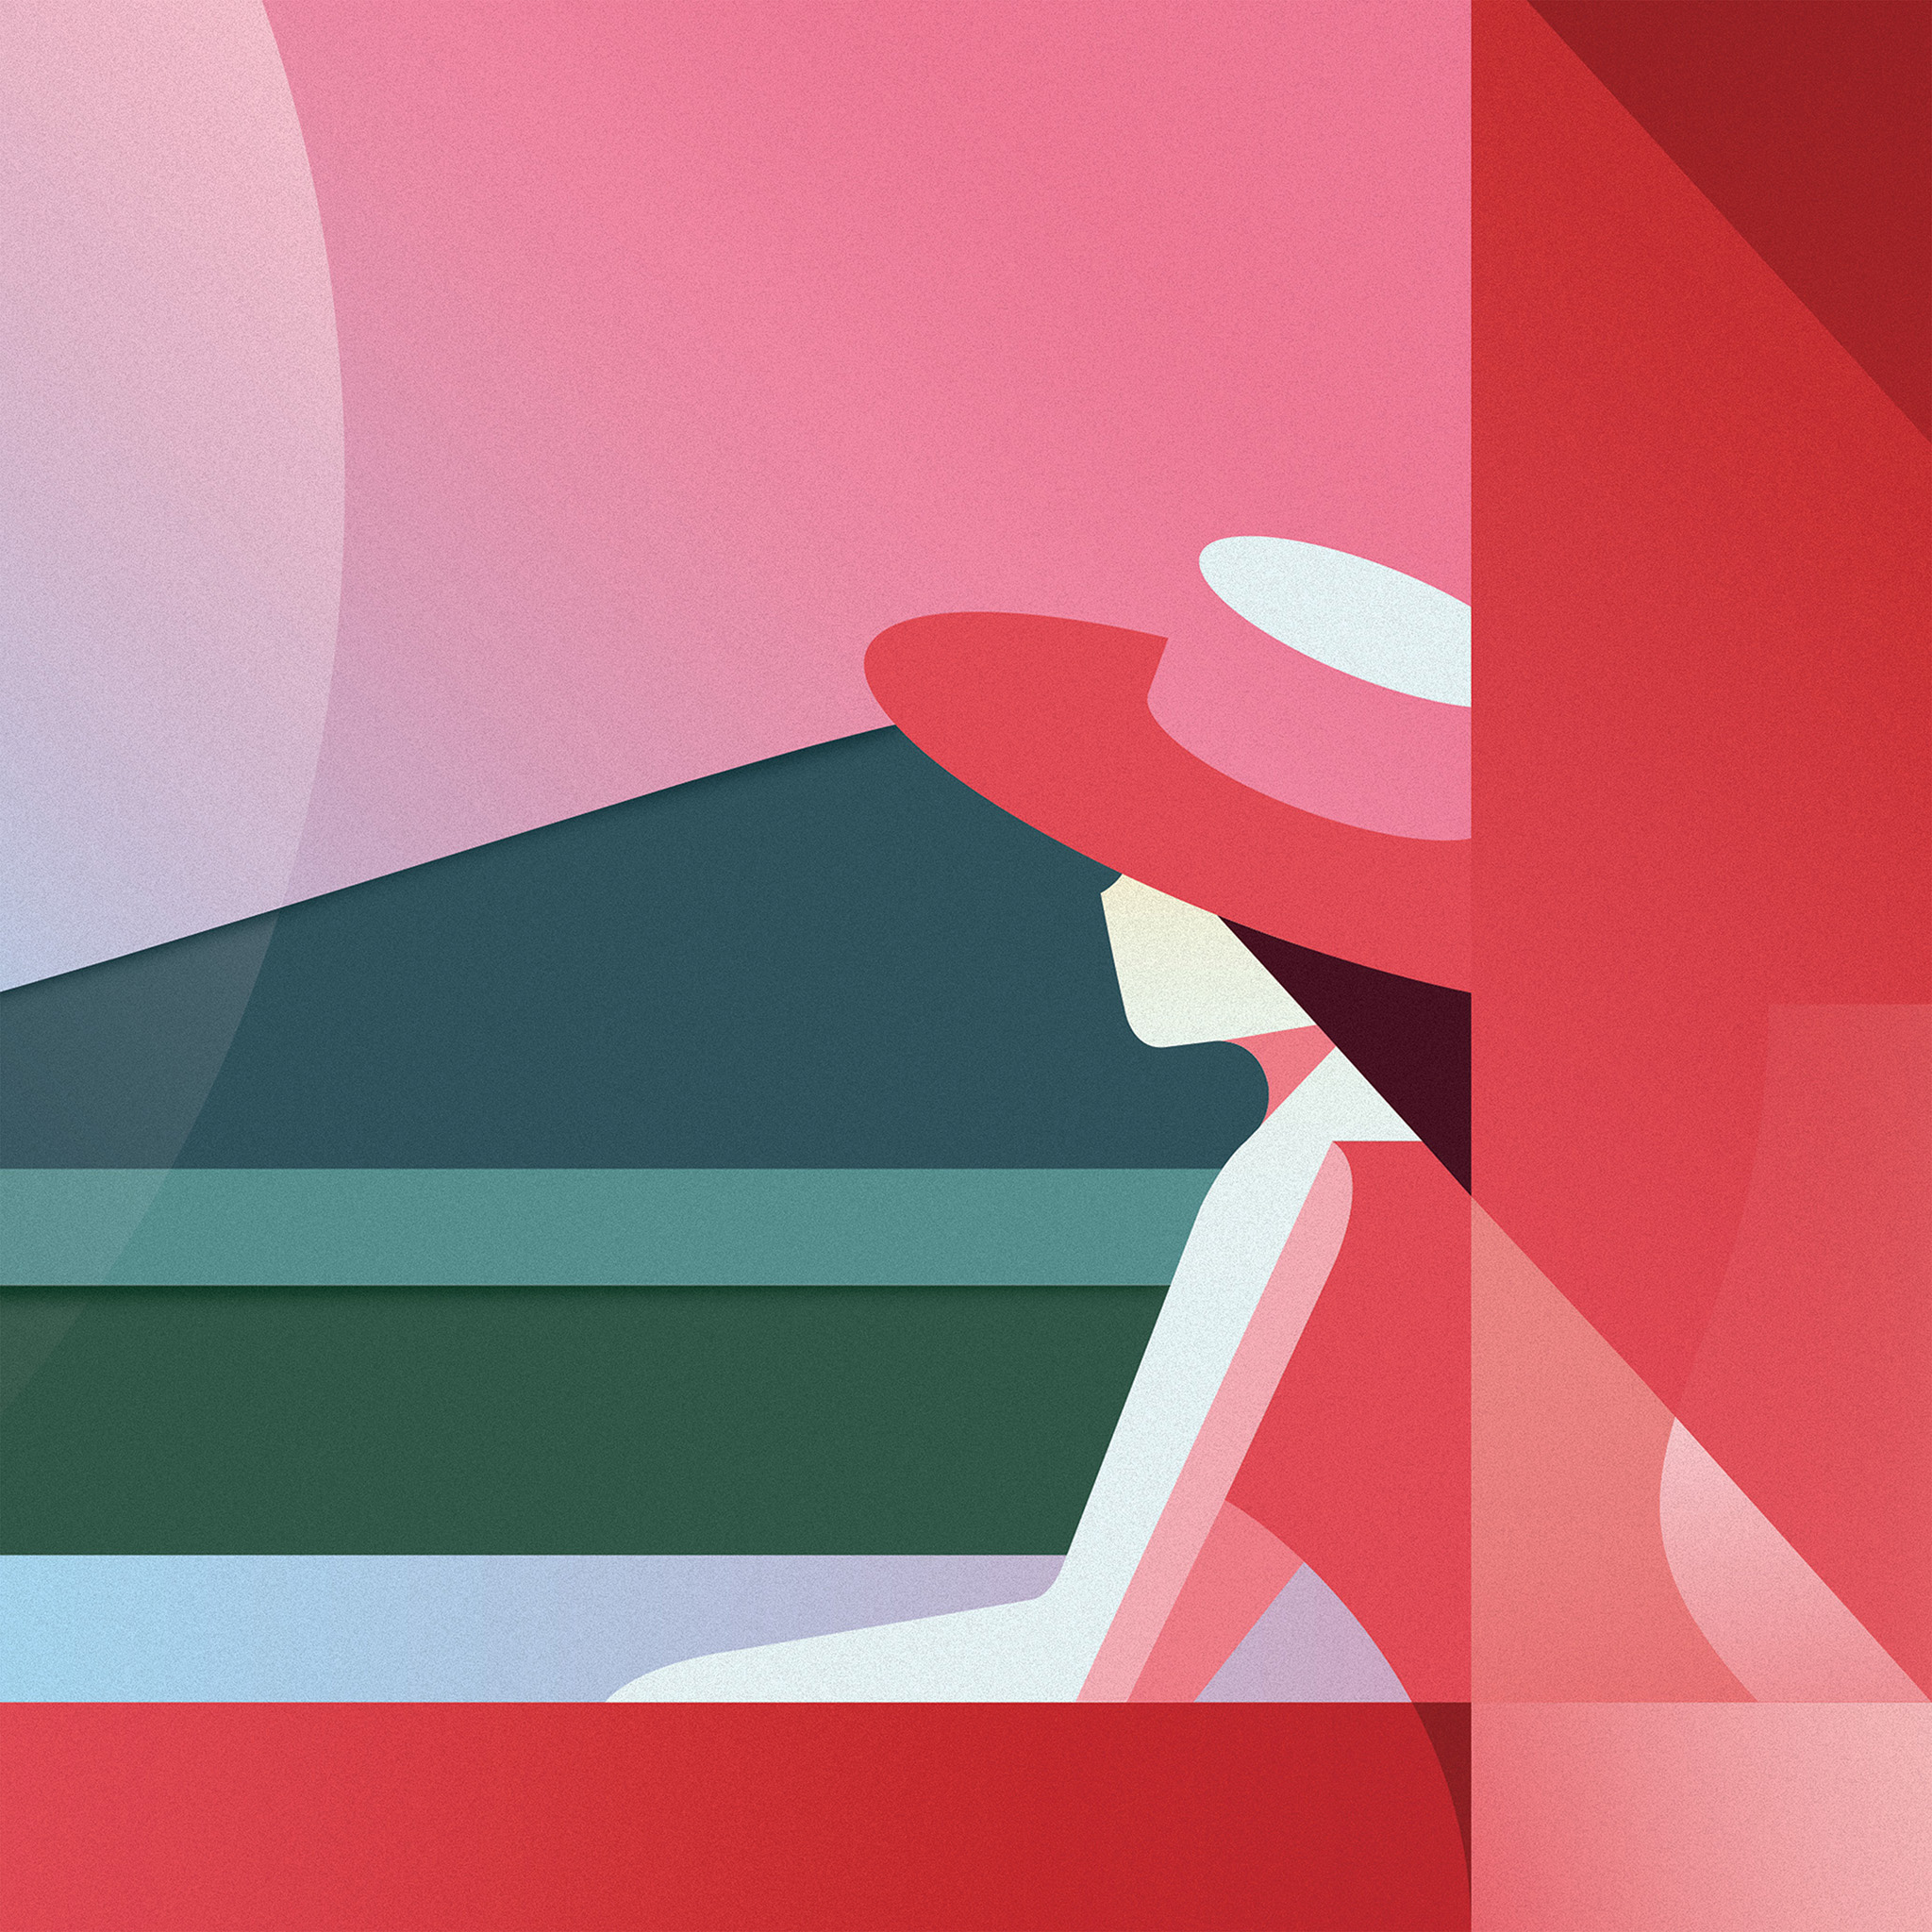 bd32-minimal-simple-digital-woman-art-illustration-wallpaper